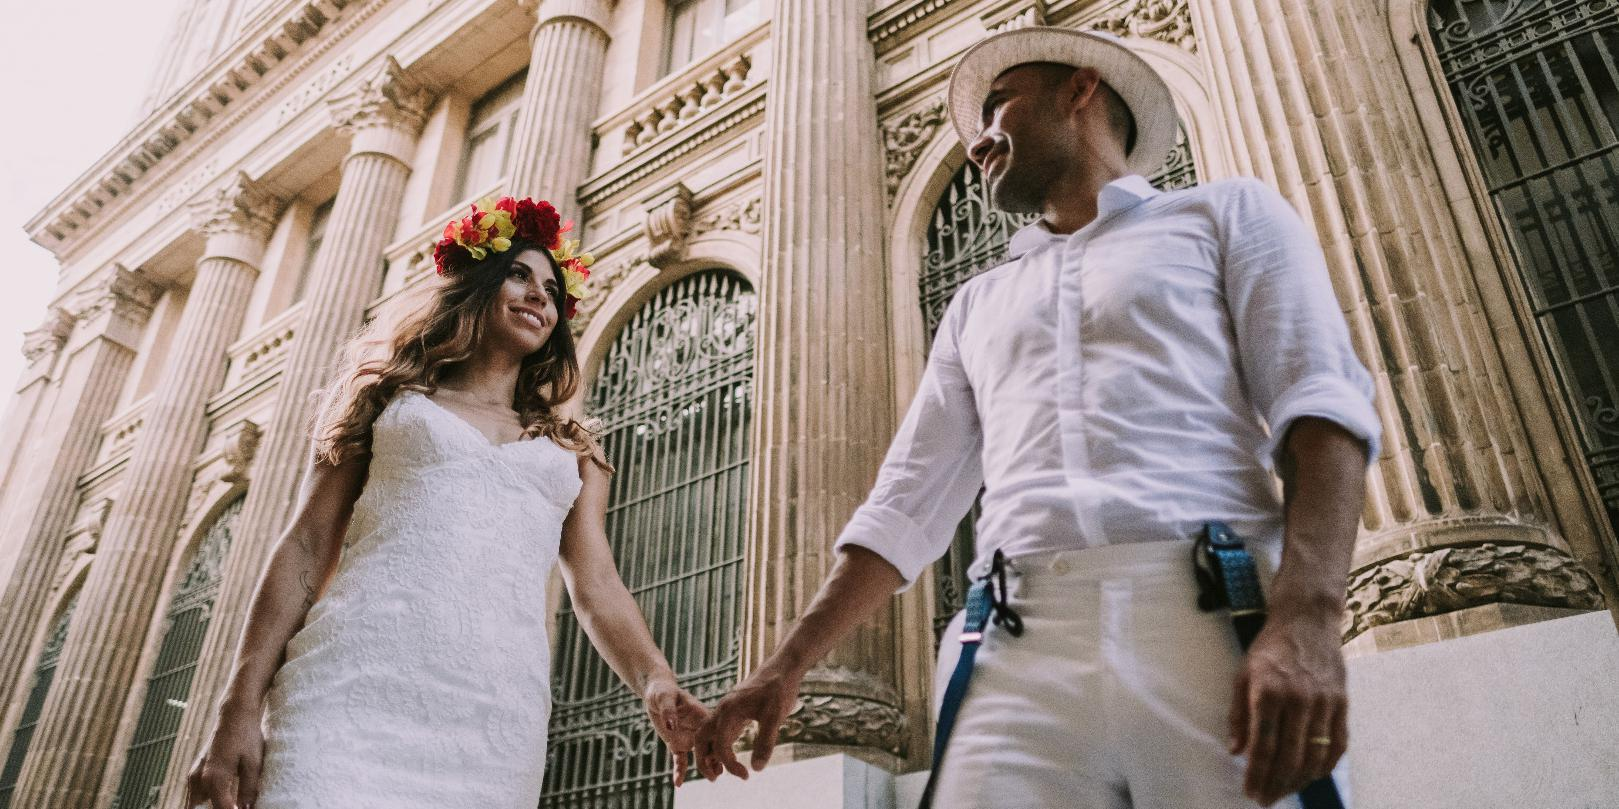 bodas-sin-clasificar-sin-tema-cuba-28951.jpg